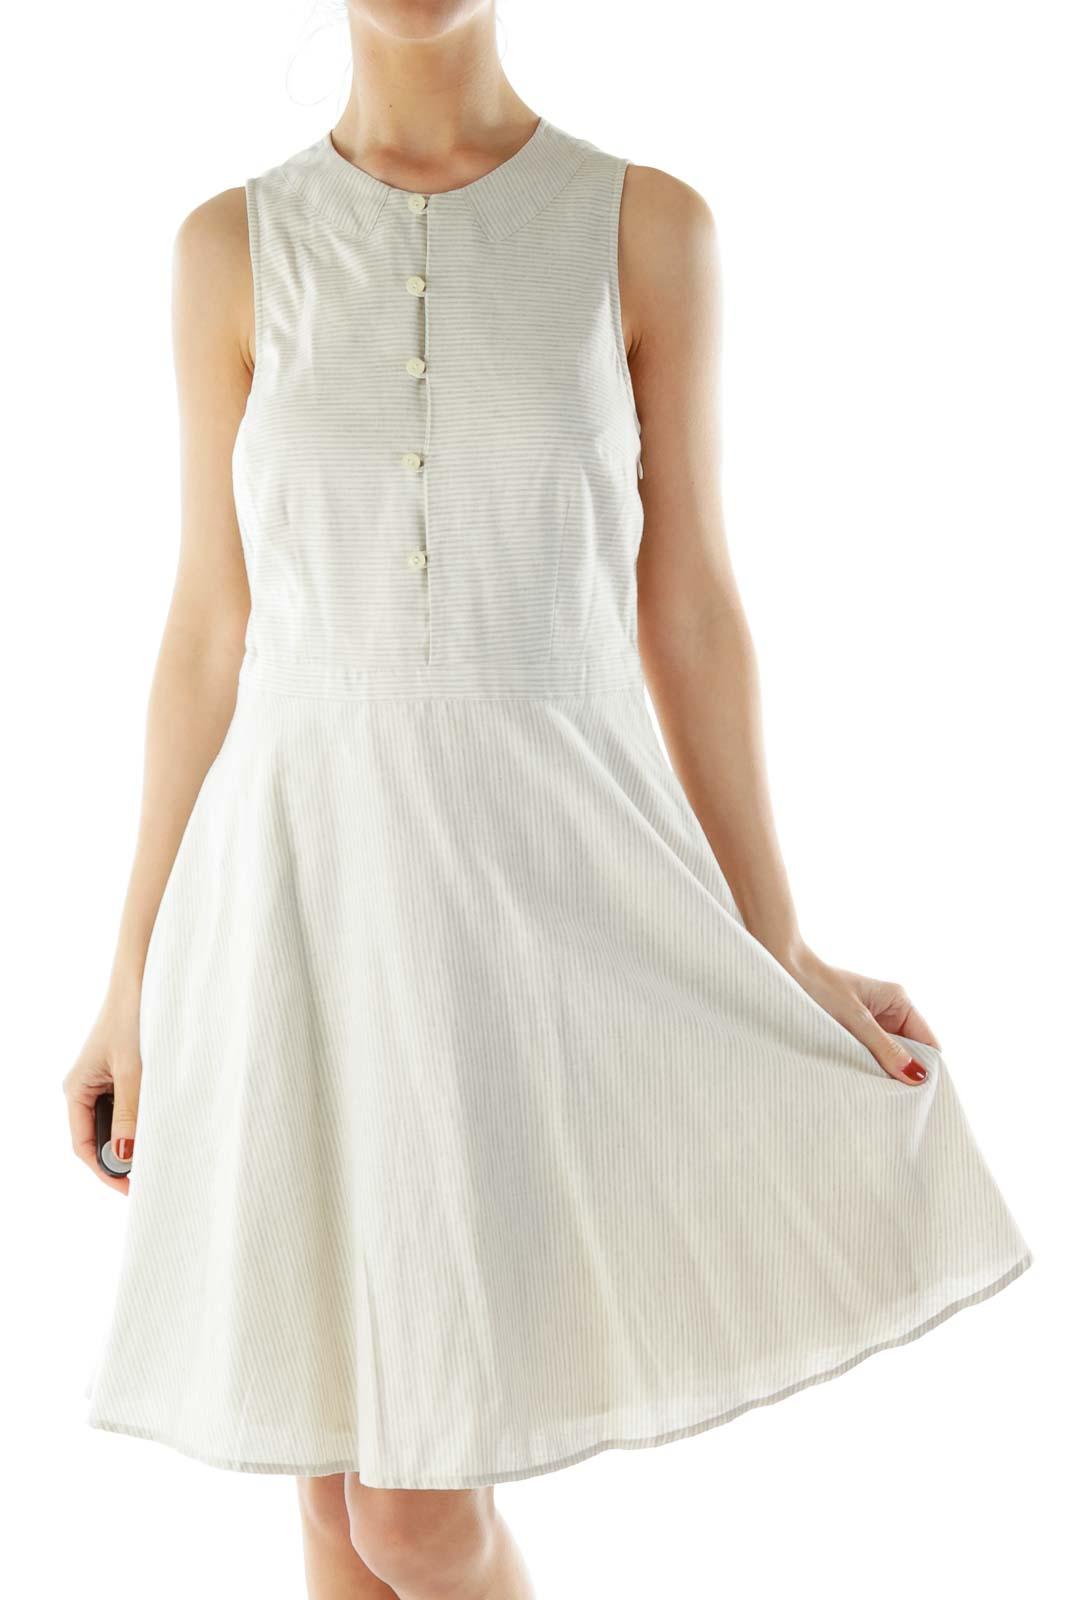 Gray Beige Pinstripe Day Dress Front